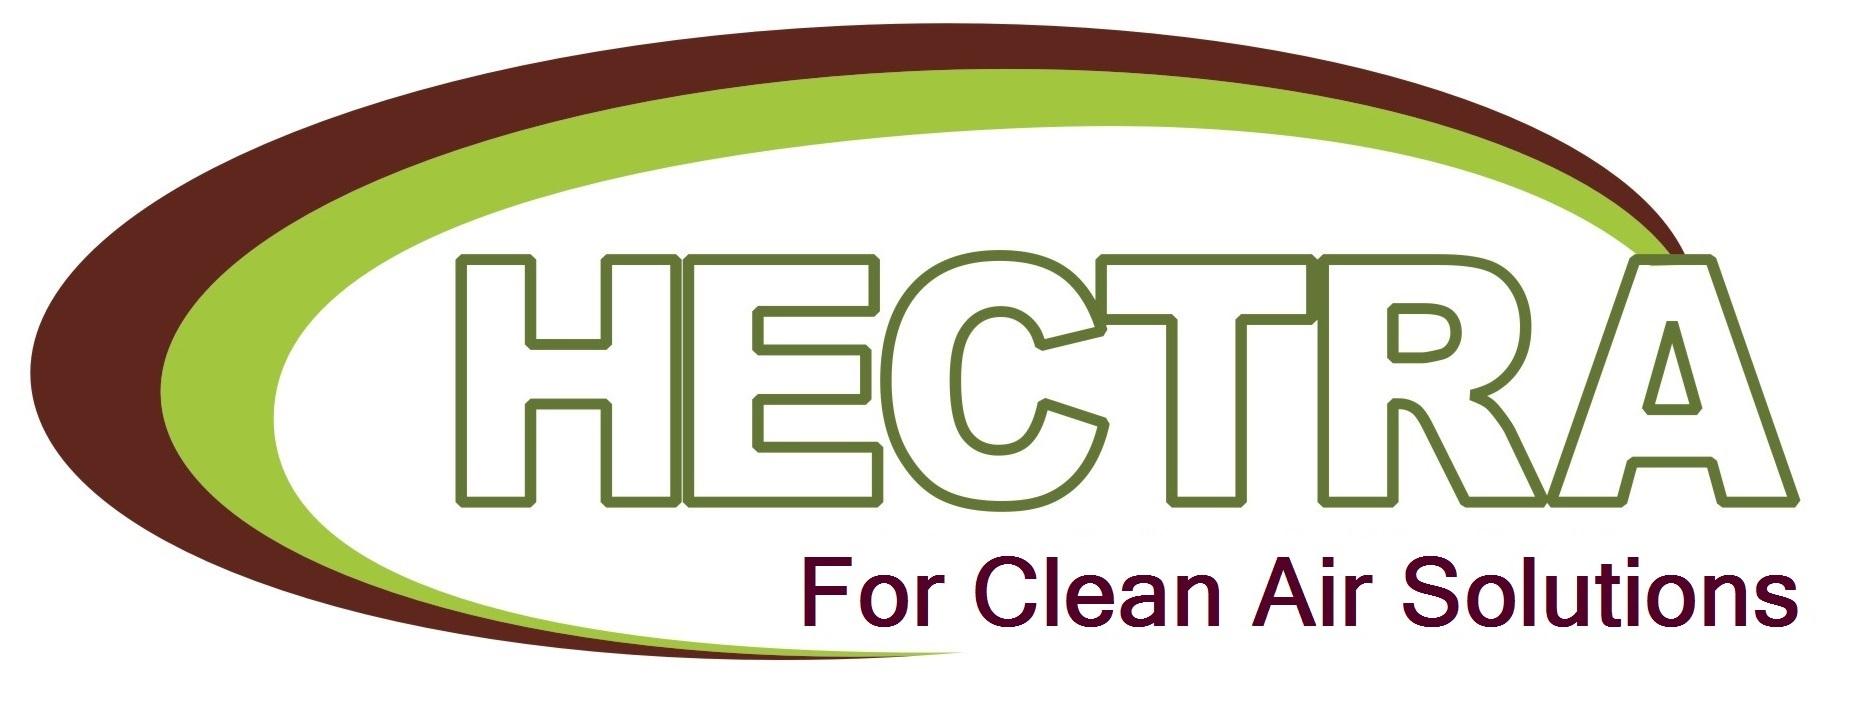 Hectra Enviro Systems